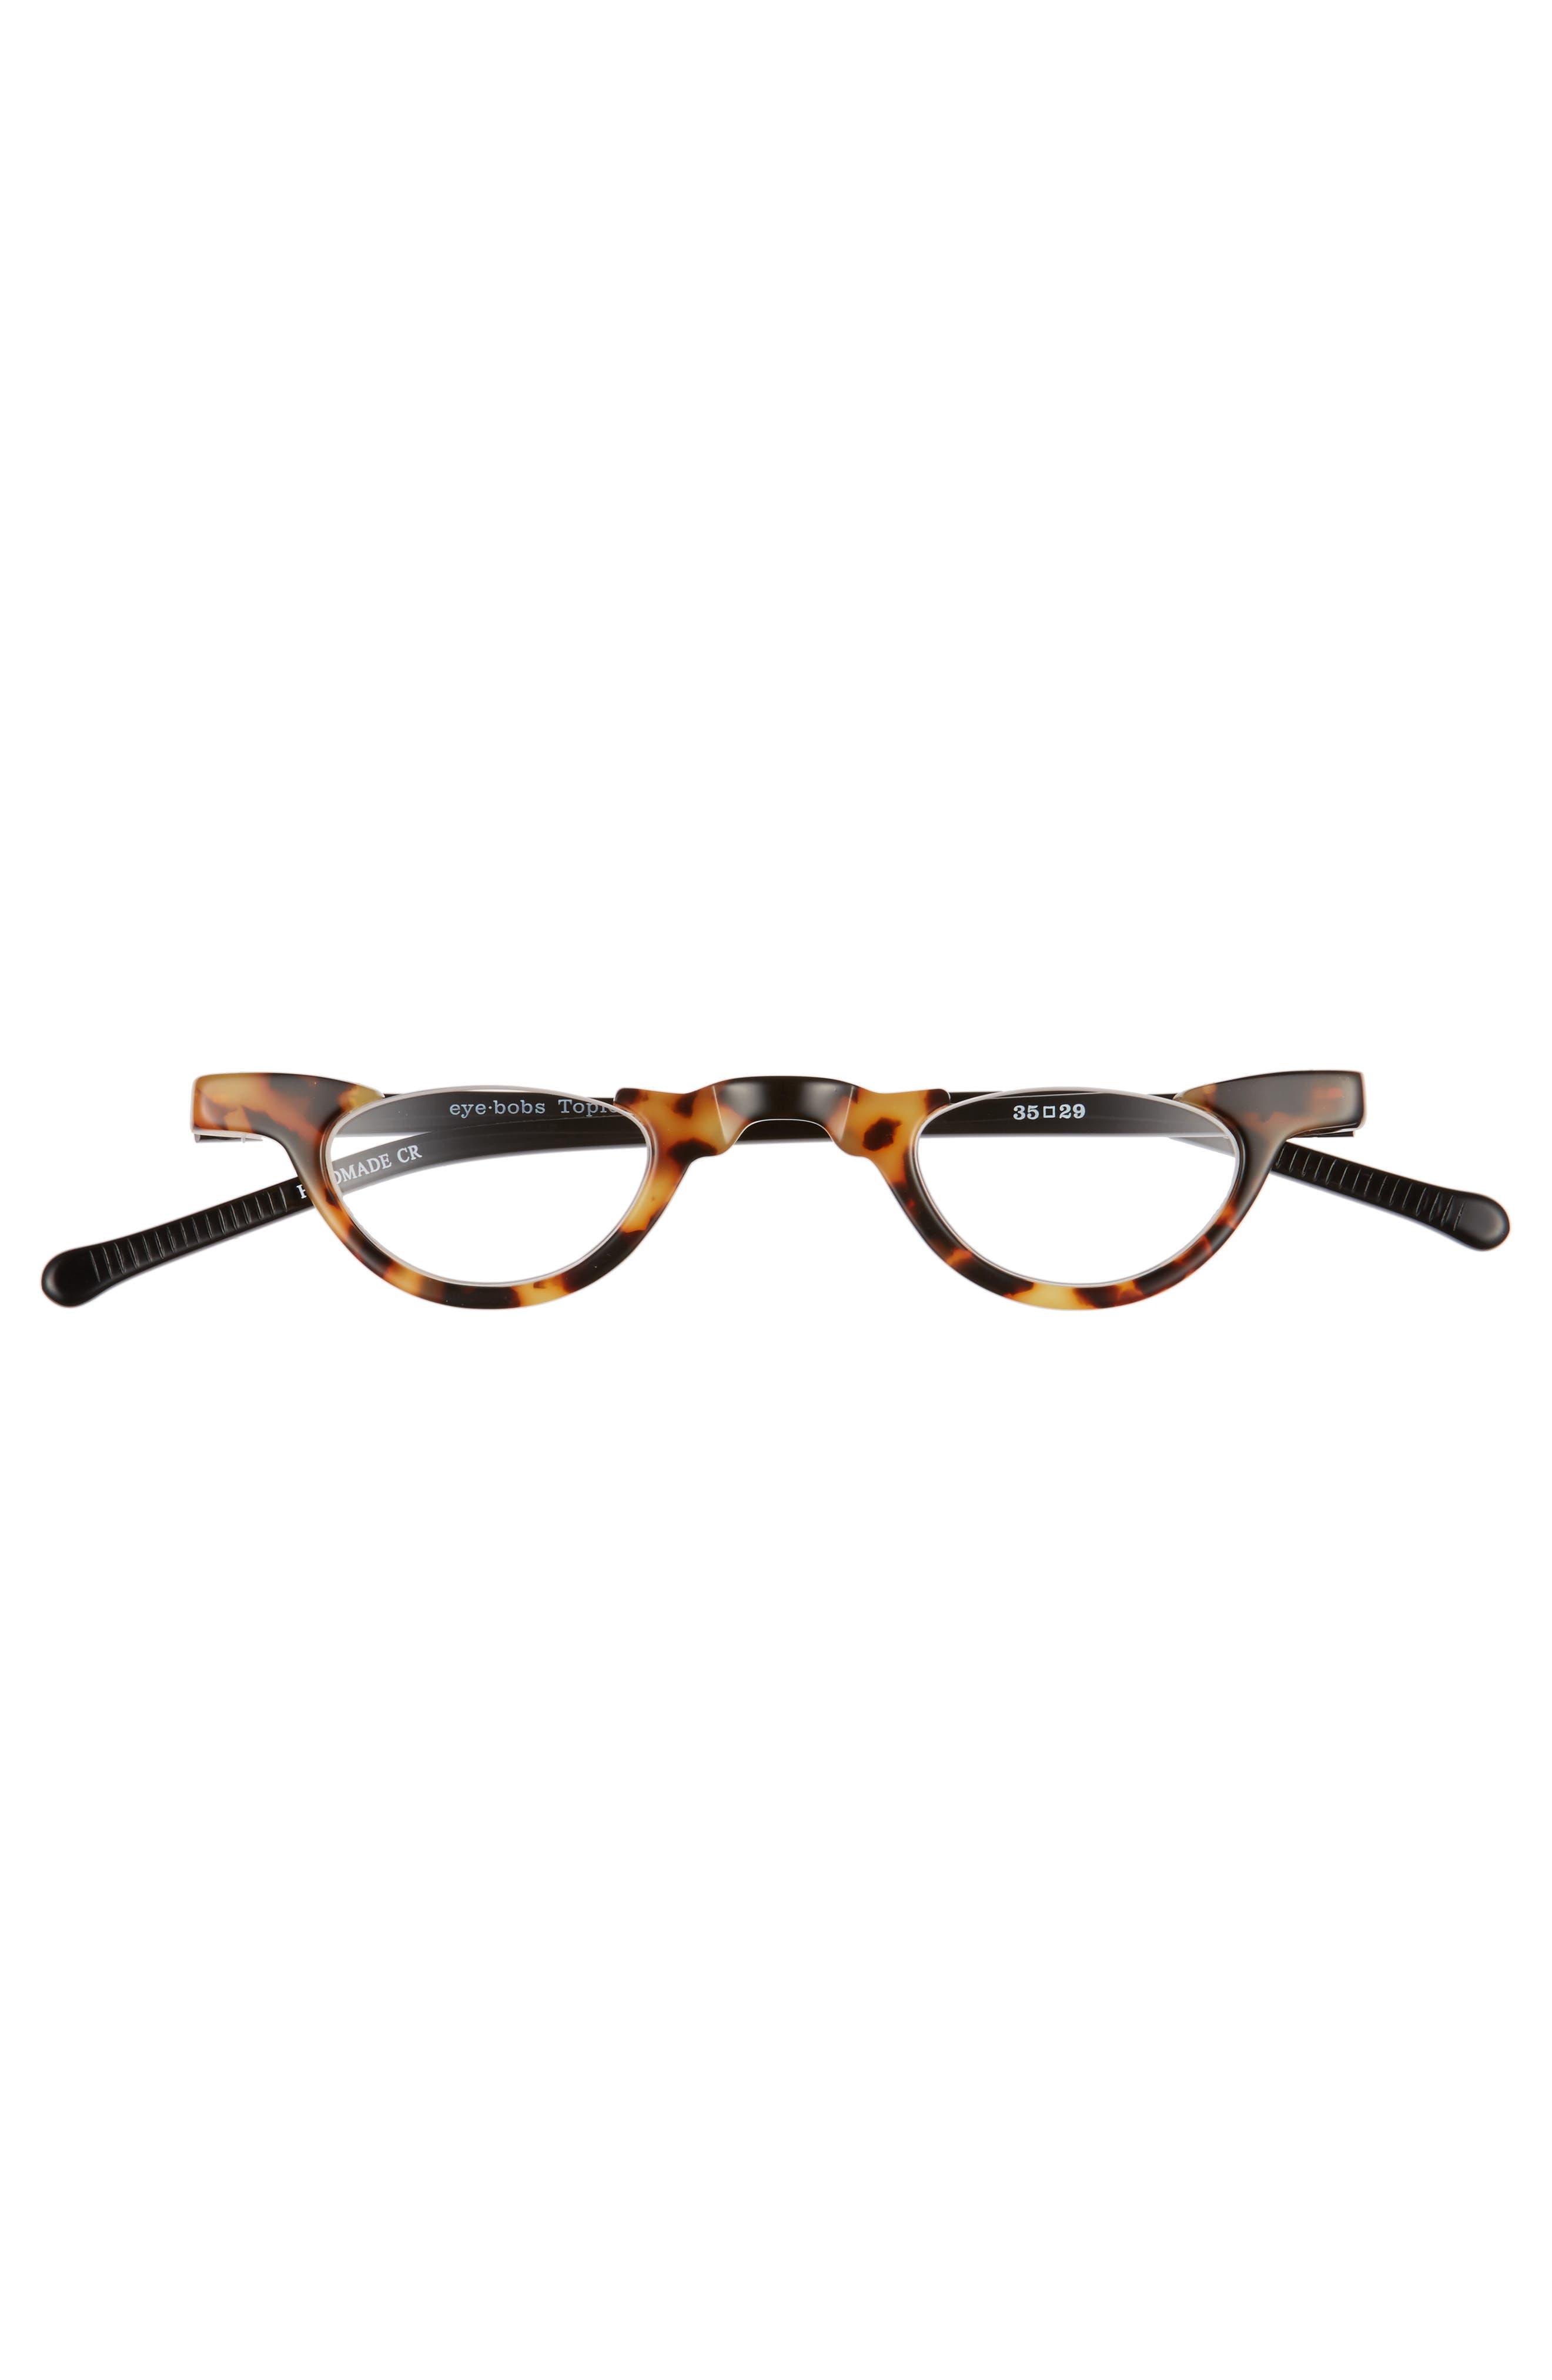 Topless 35mm Reading Glasses,                             Alternate thumbnail 2, color,                             211